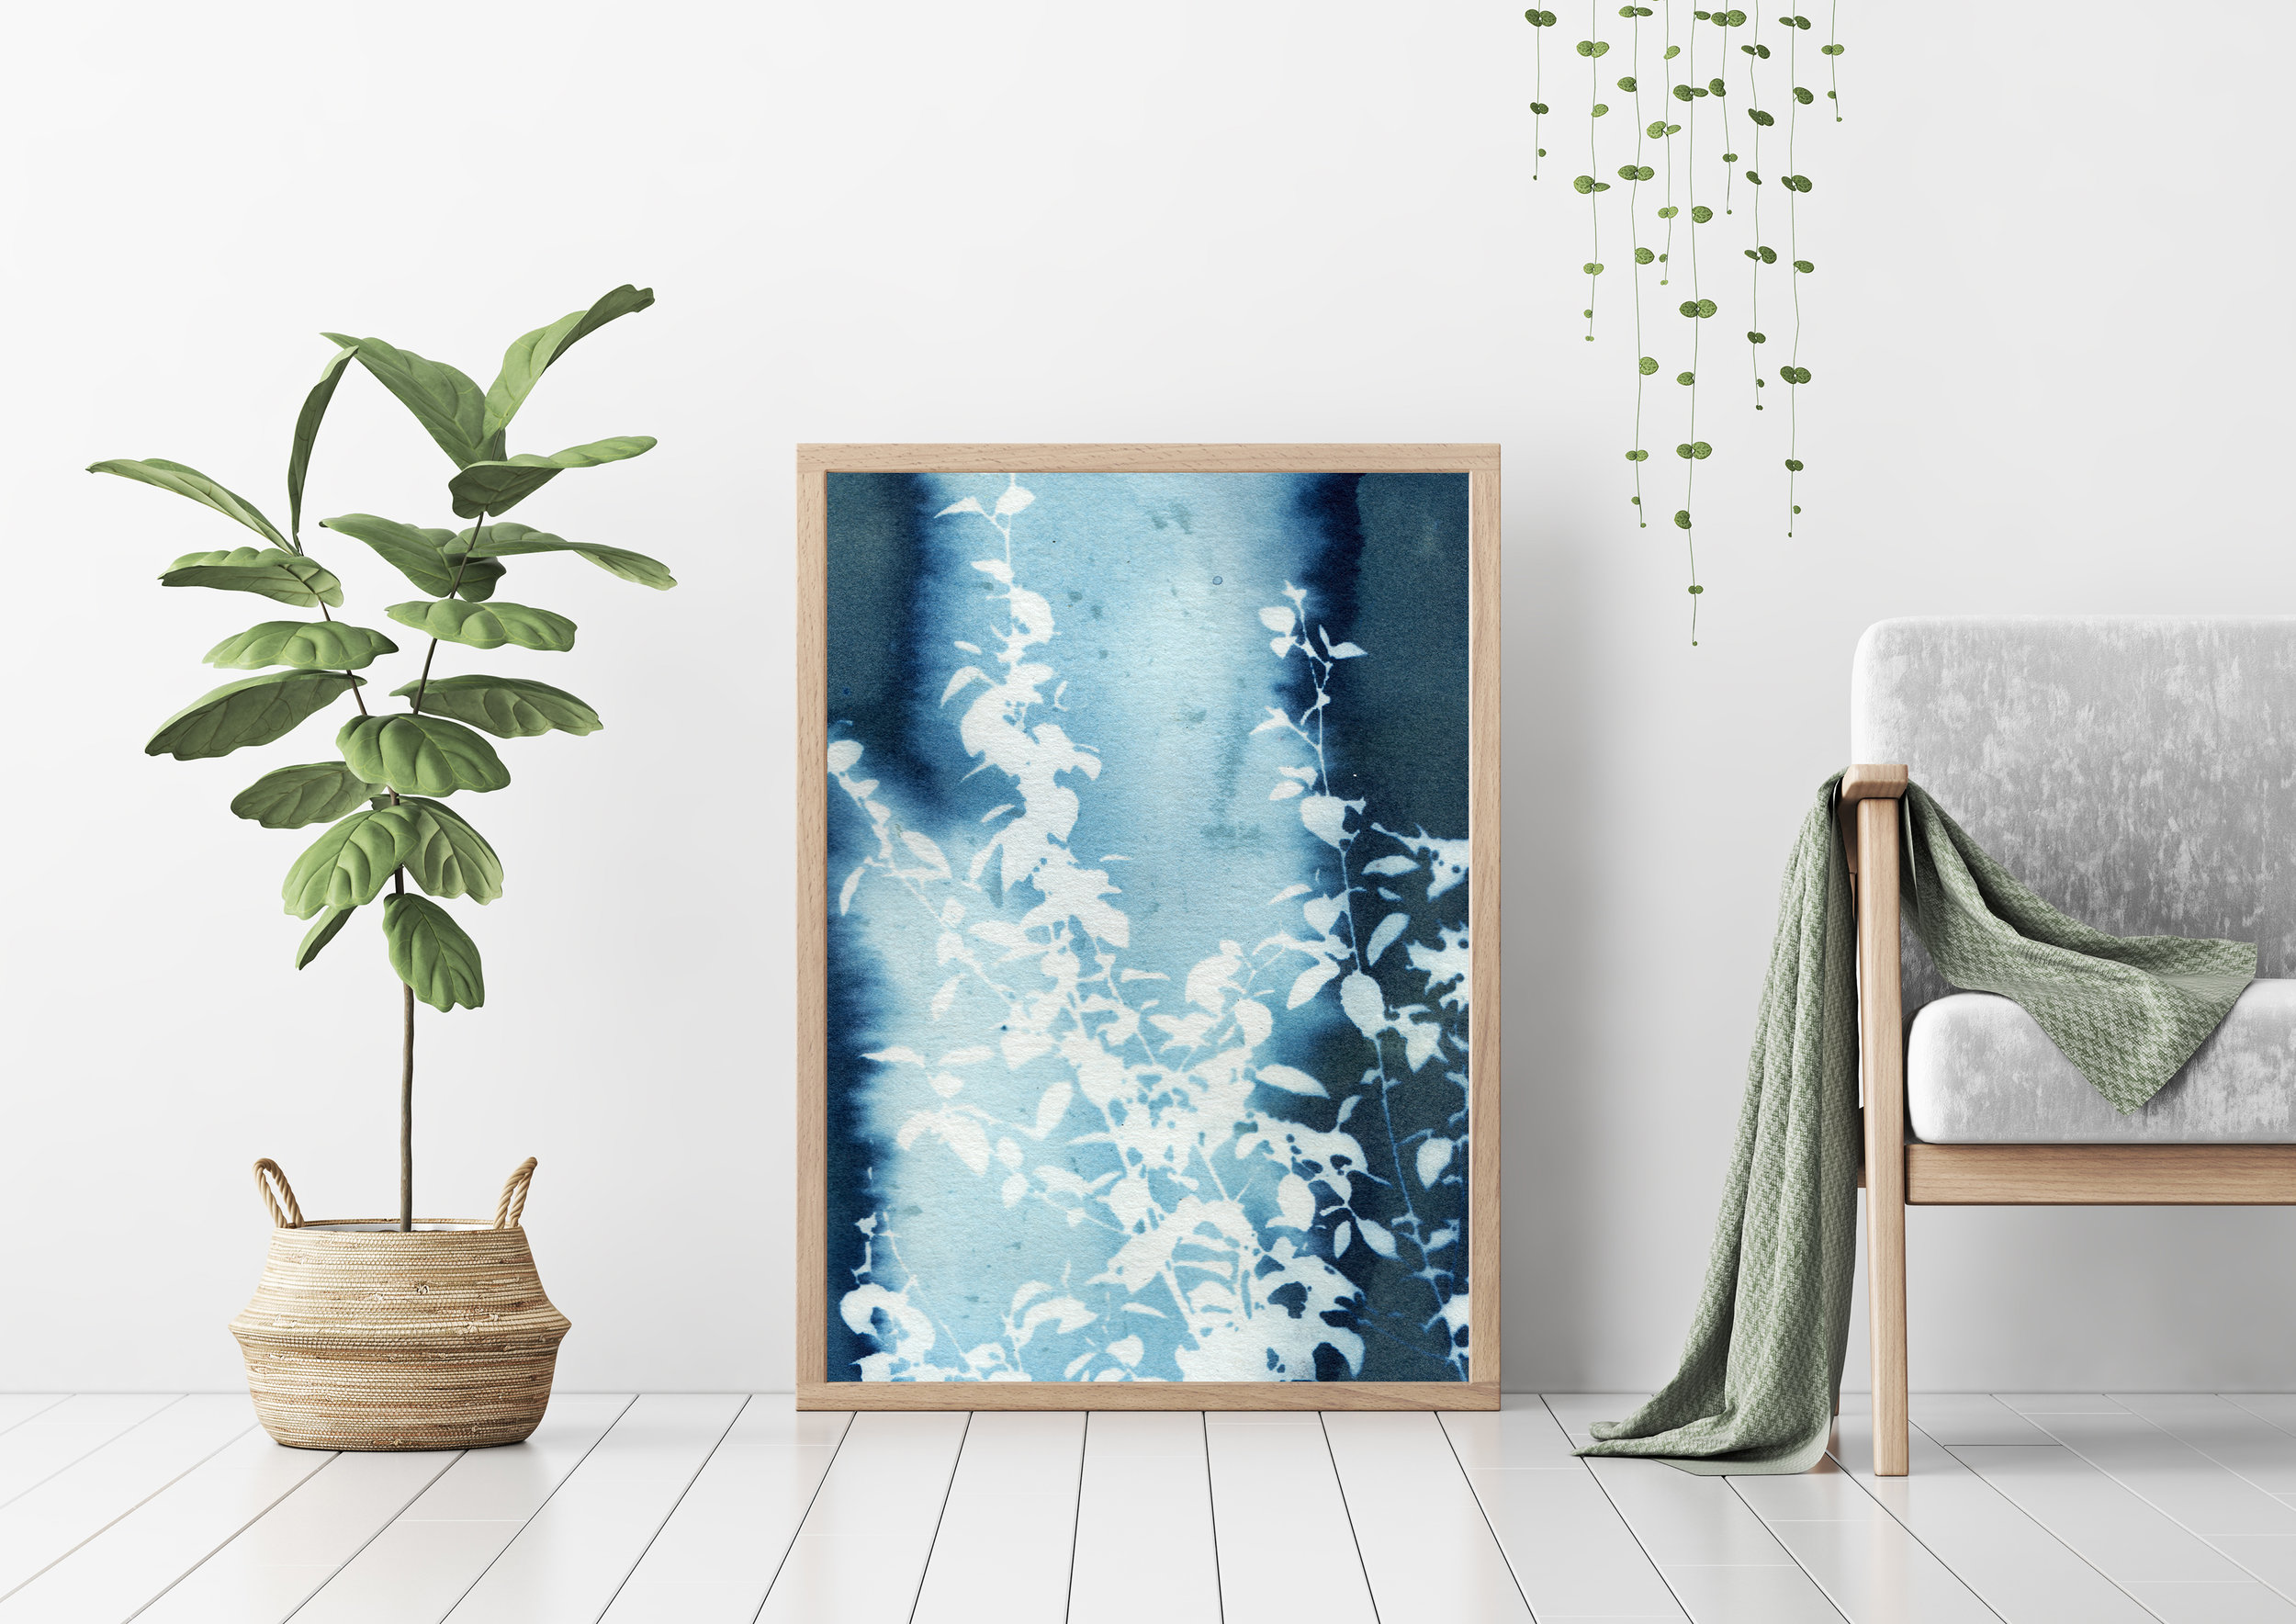 'Blue Highways' cyanotype print by Krista McCurdy